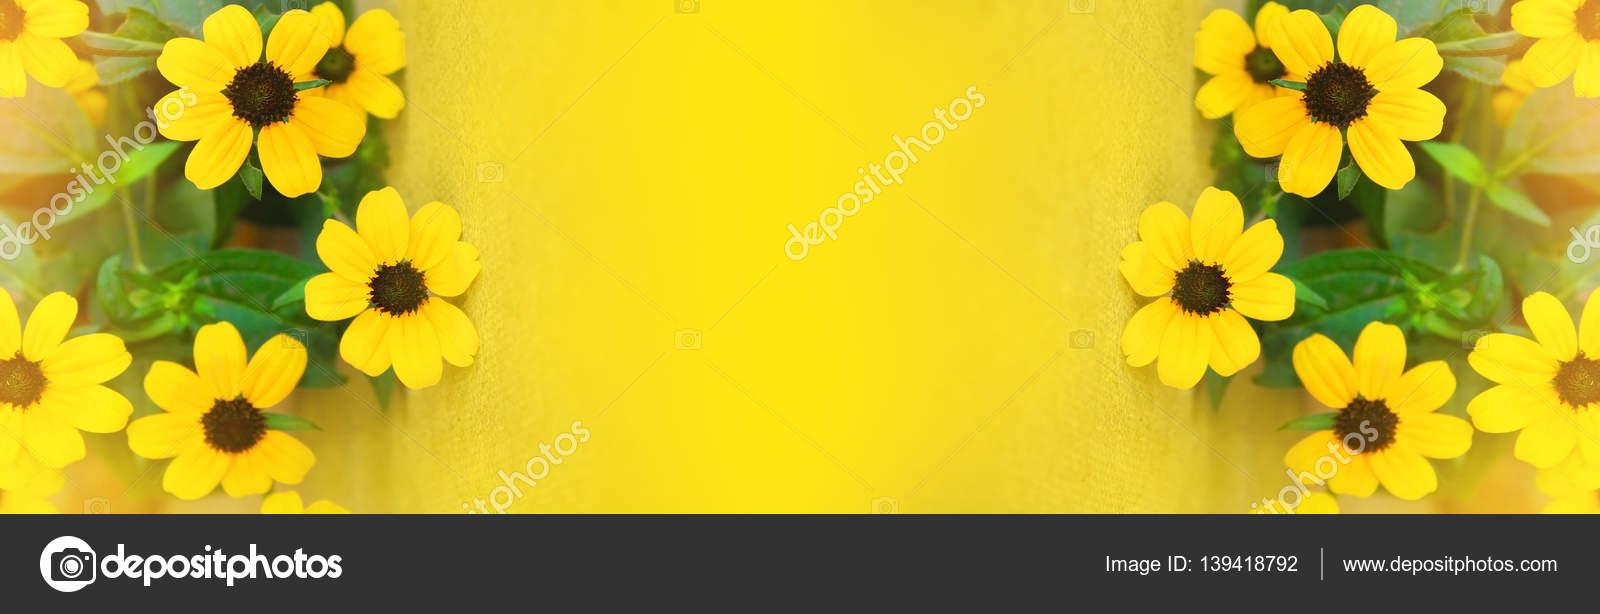 Pretty Yellow Flowers On Burlap Stock Photo Burnyipotok 139418792